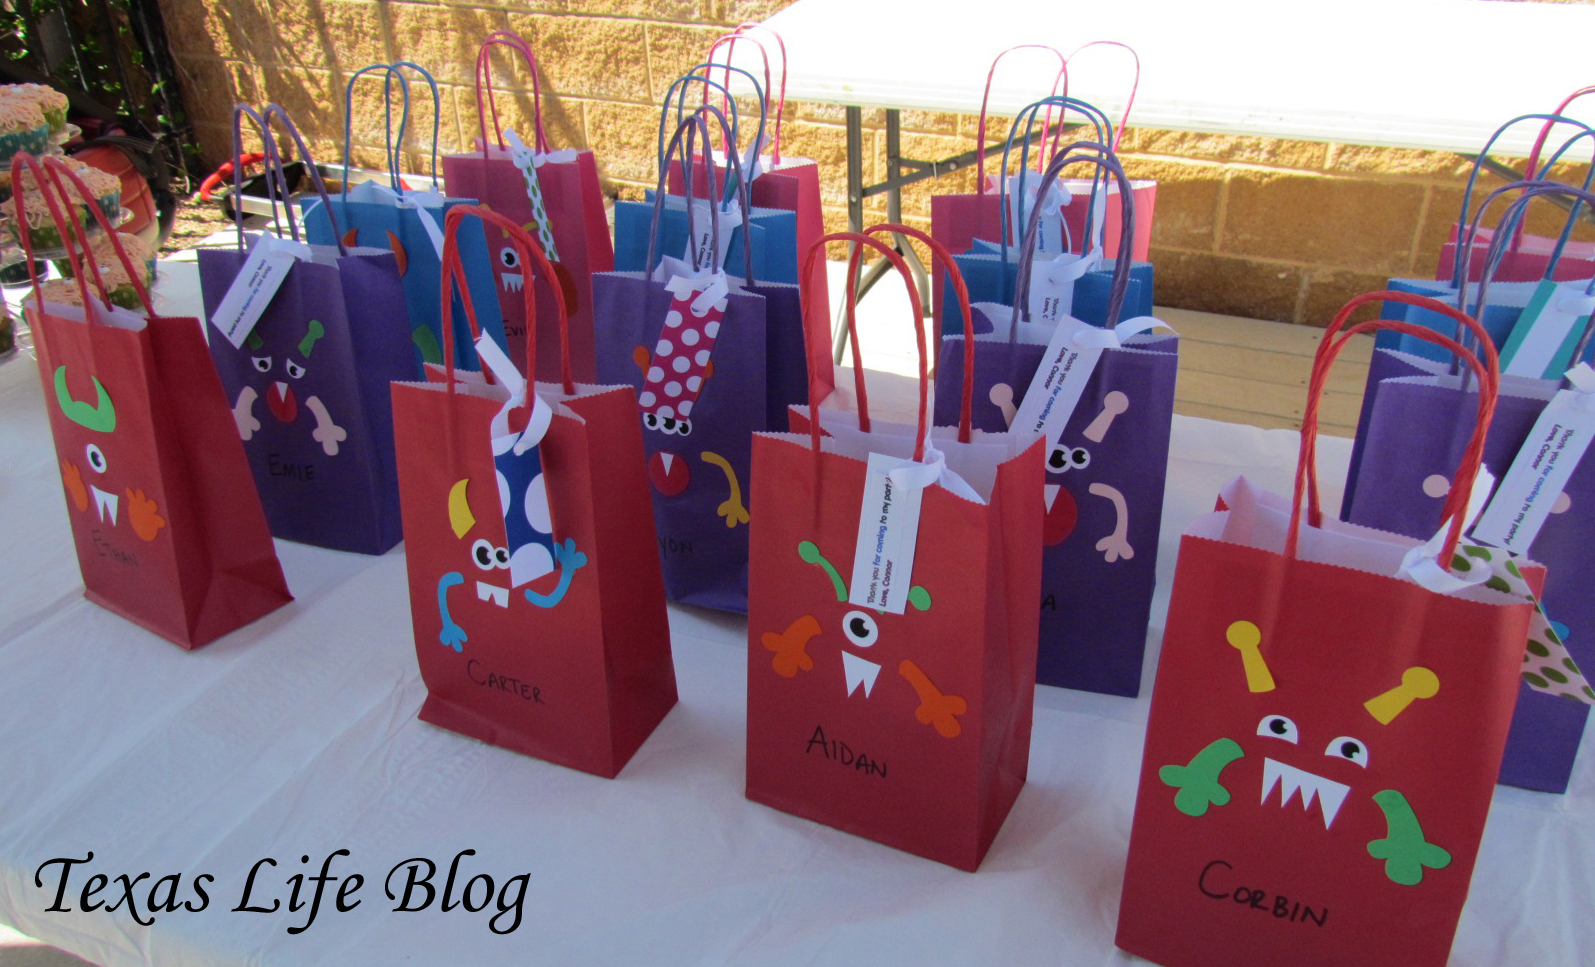 10 Lovely Goody Bag Ideas For Girls decor goodie bag ideas for toddlers goodie bag ideas for 4 year olds 2020